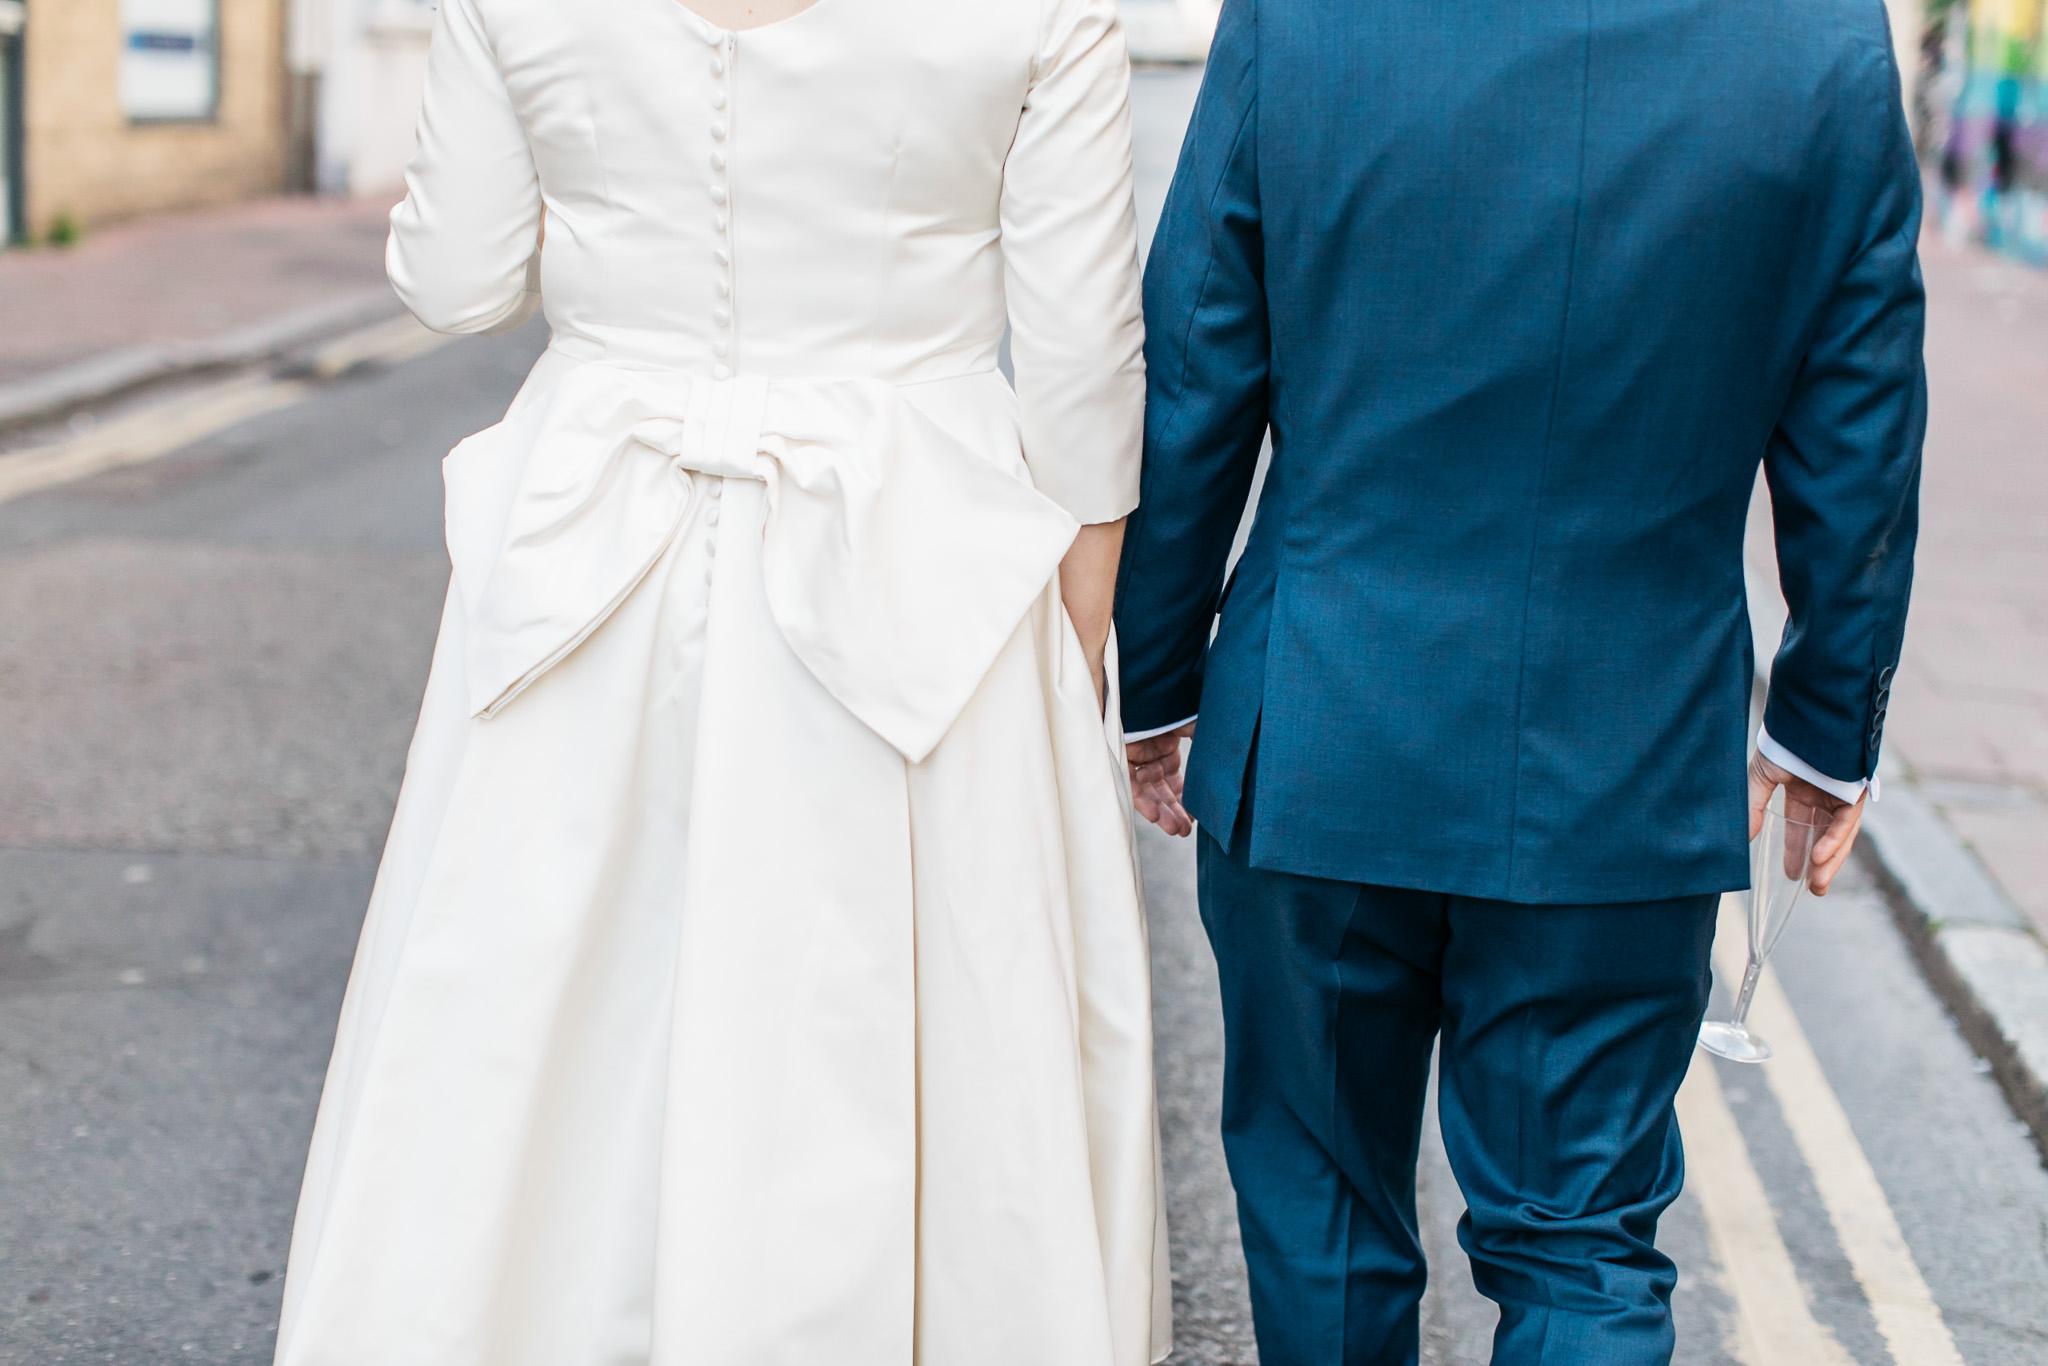 st_andrews_fabrica_brighton_wedding_600.jpg